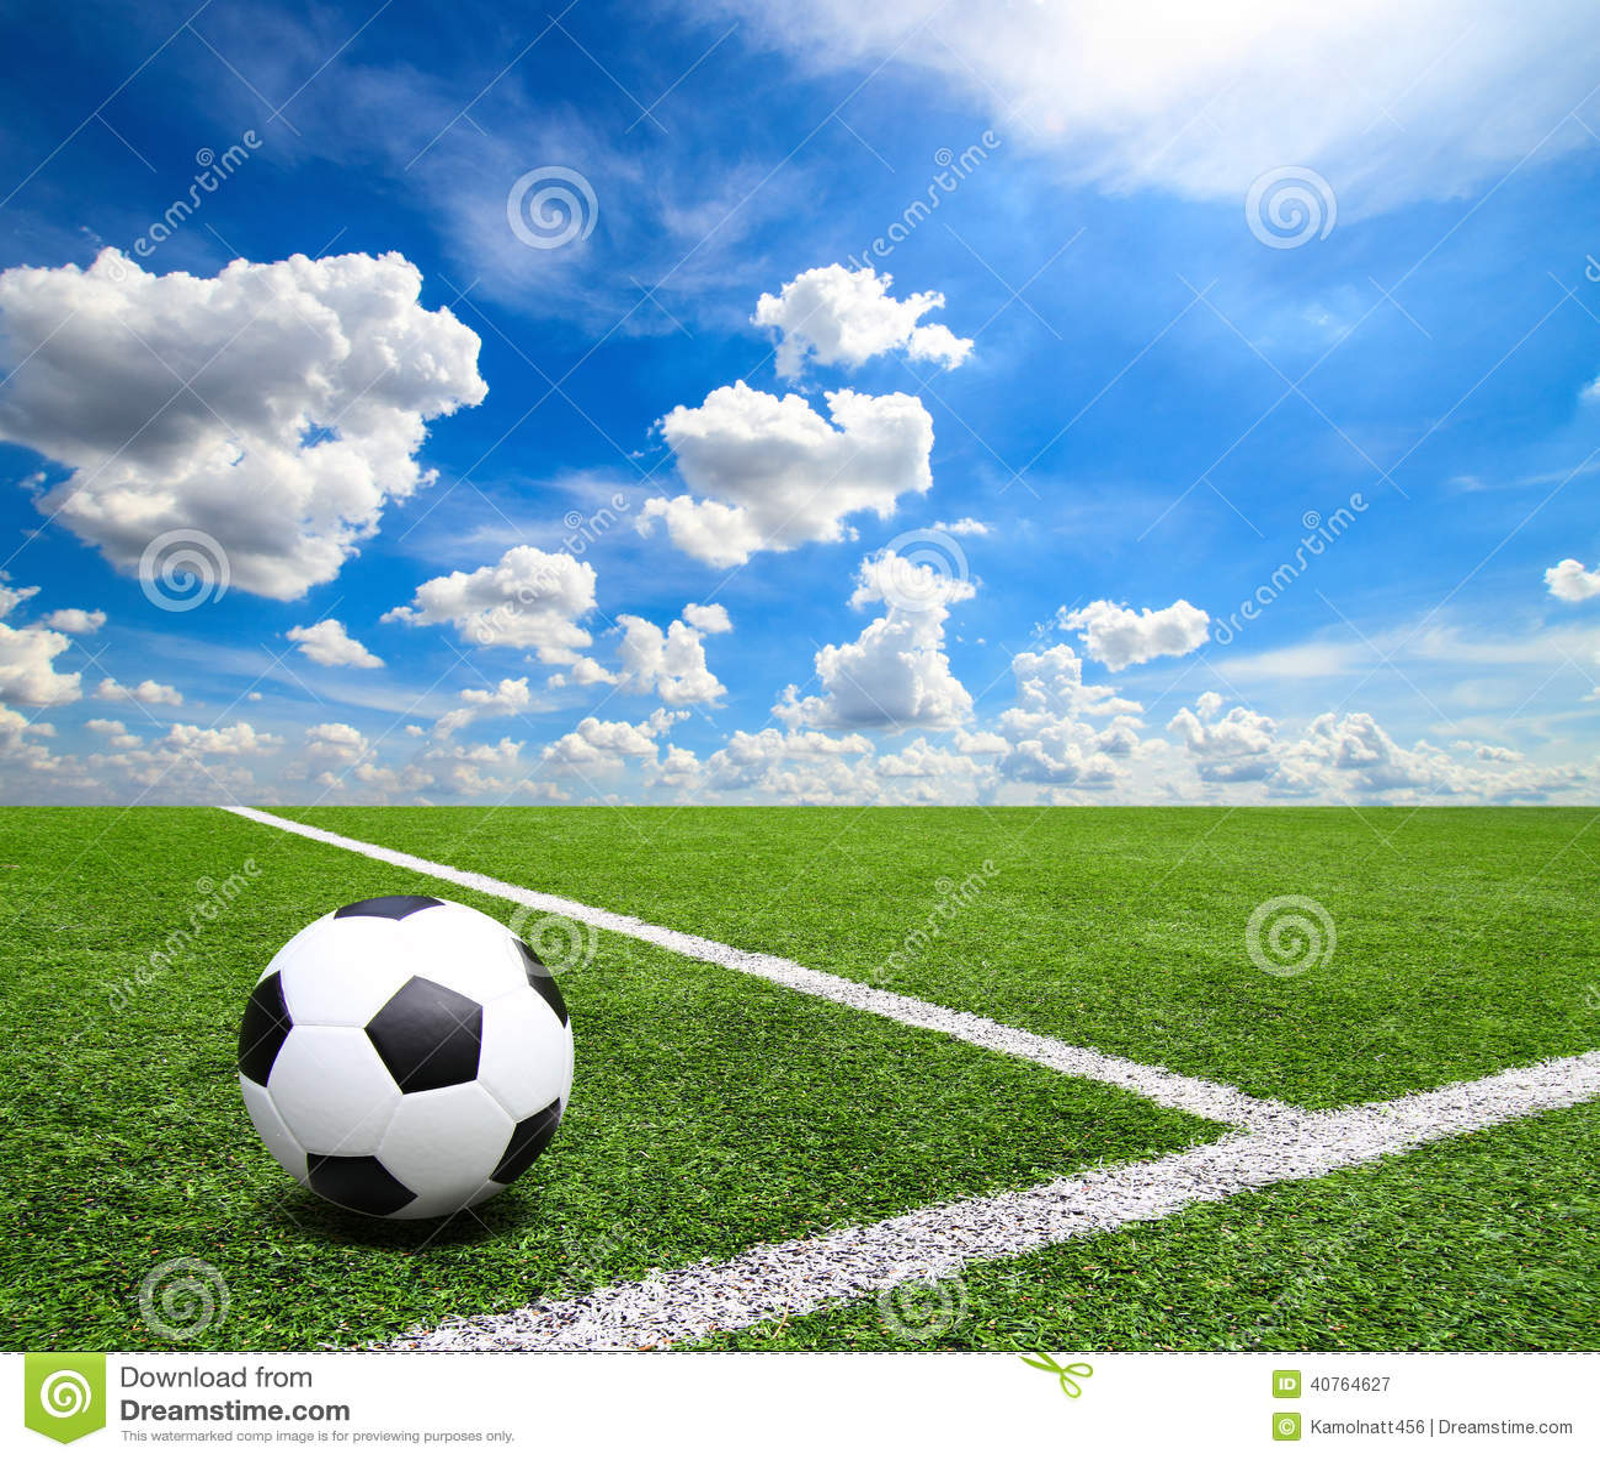 Football And Soccer Field Grass Stadium Blue Sky ...